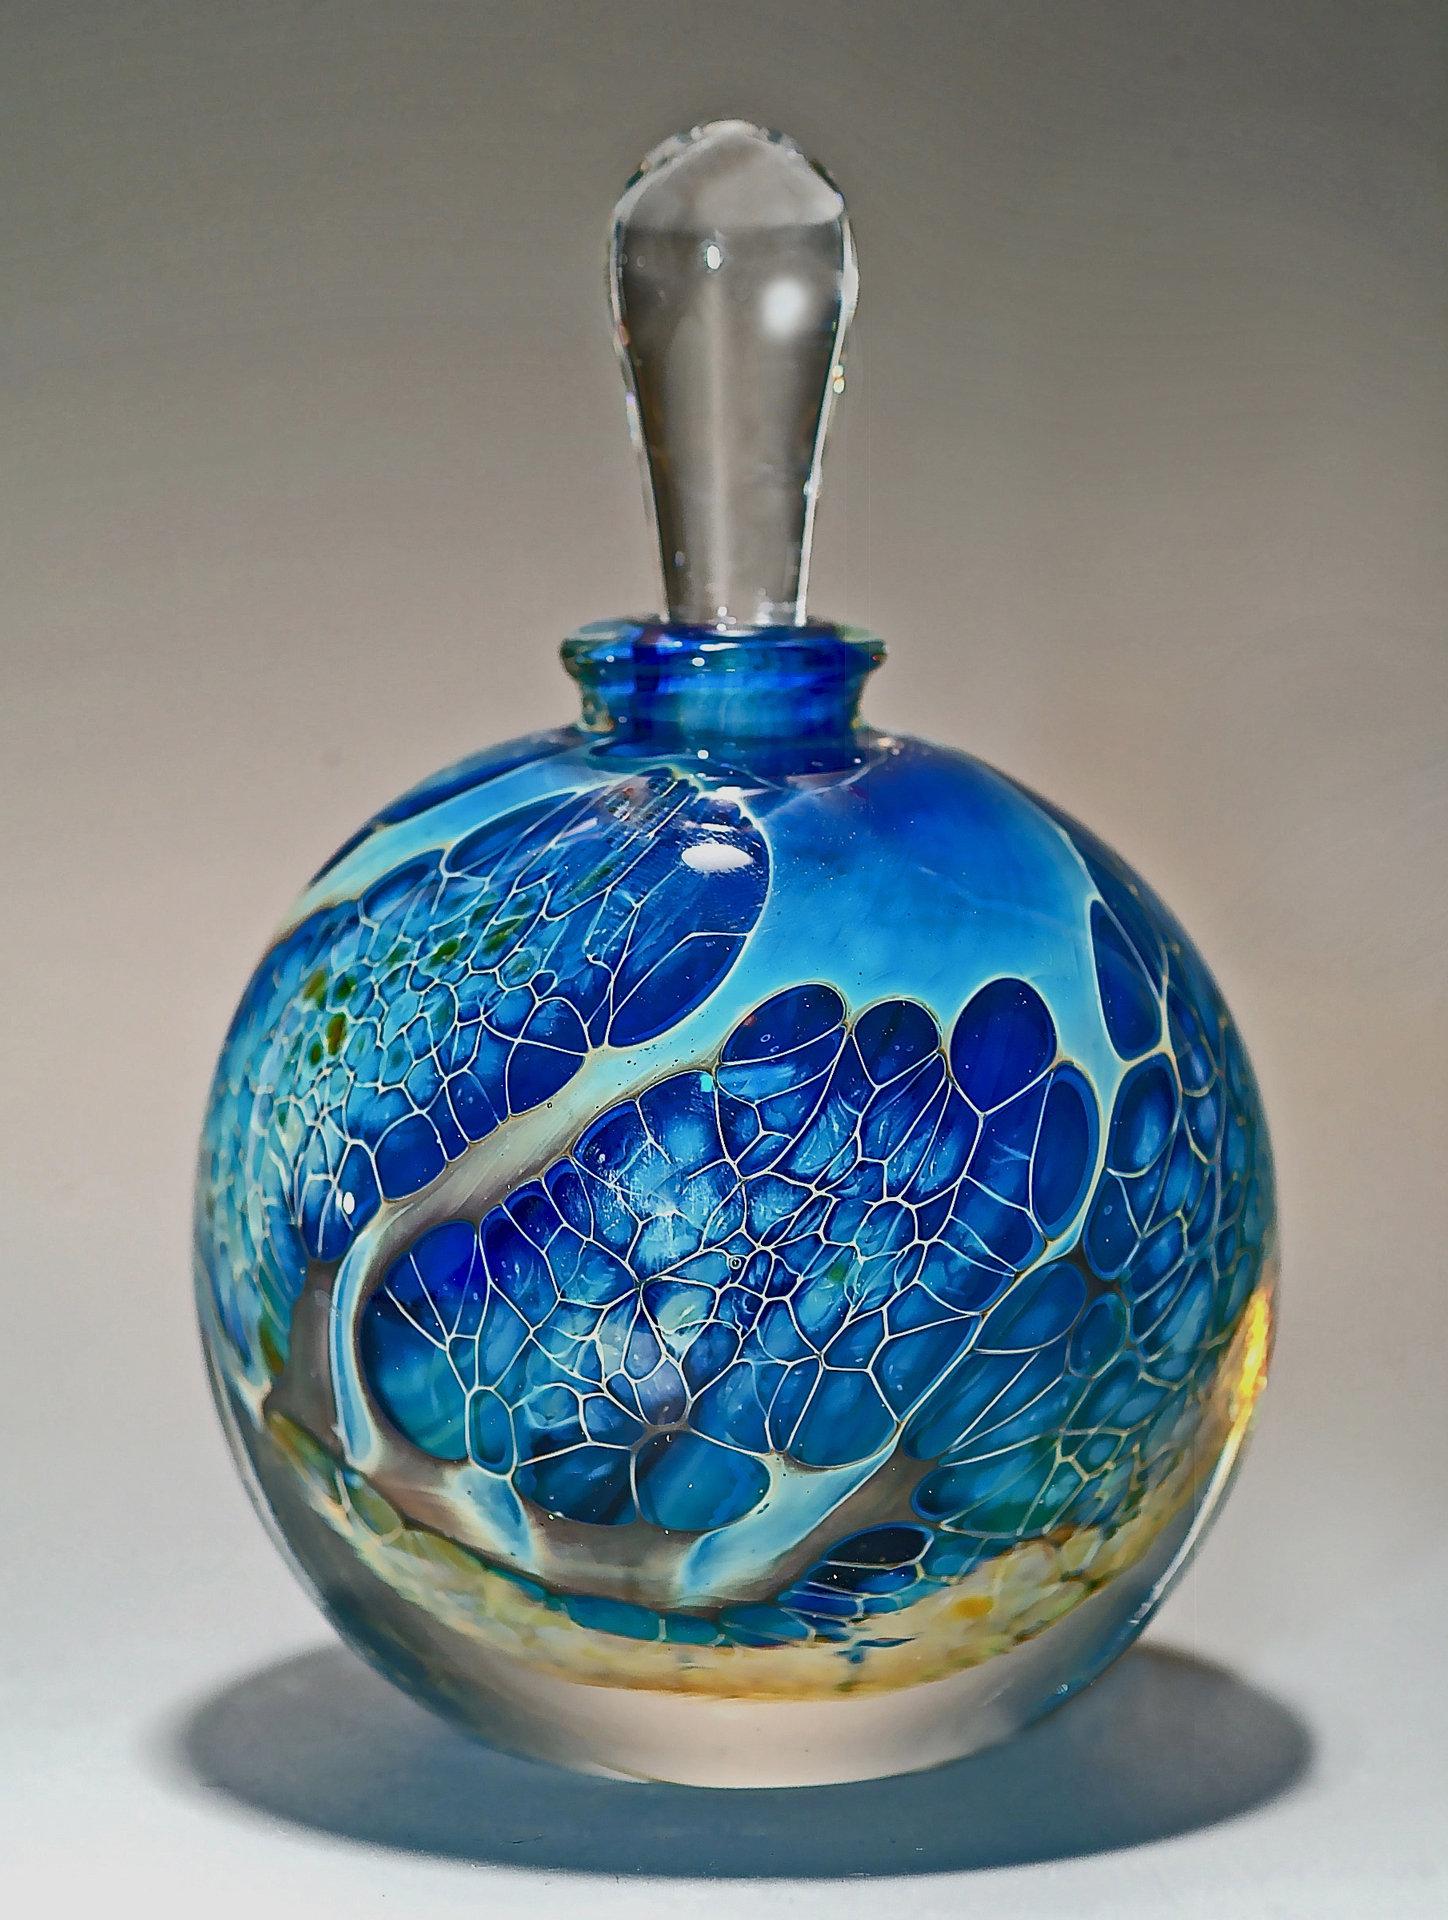 Round Silver Veil Teal Perfume Bottle by Robert Burch (Art ...